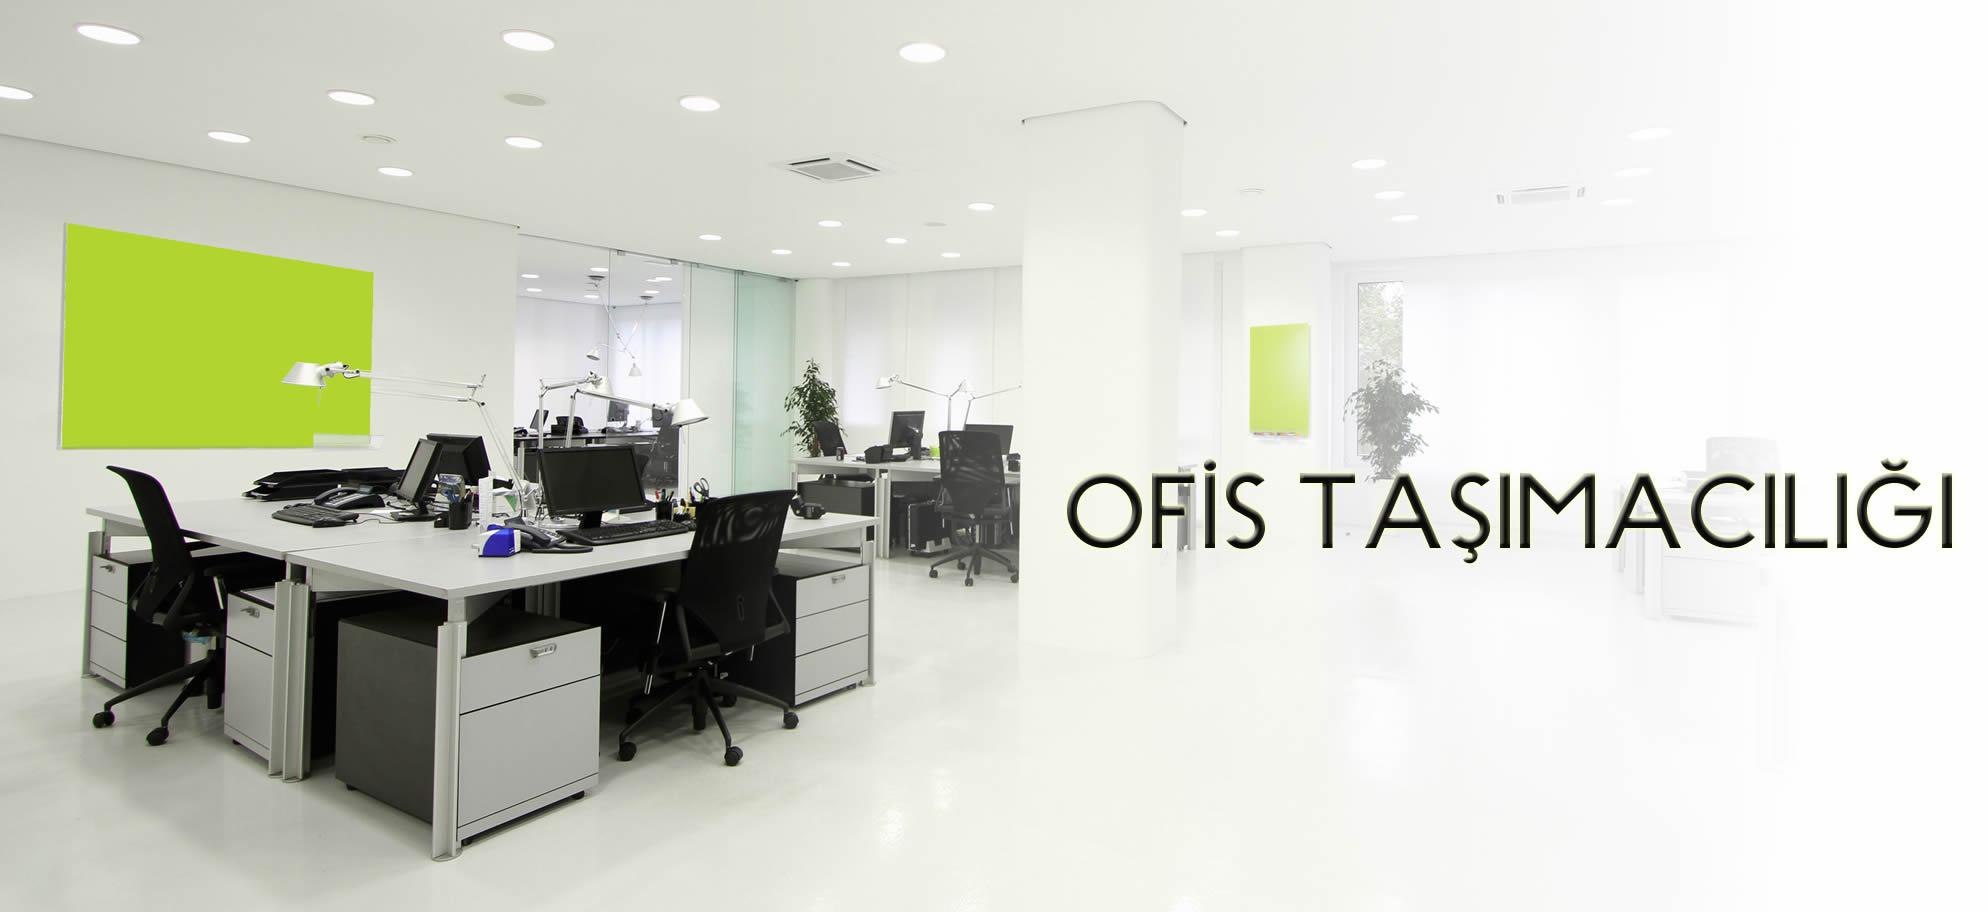 İstanbul Ofis Taşımacılığı | Nar Nakliyat